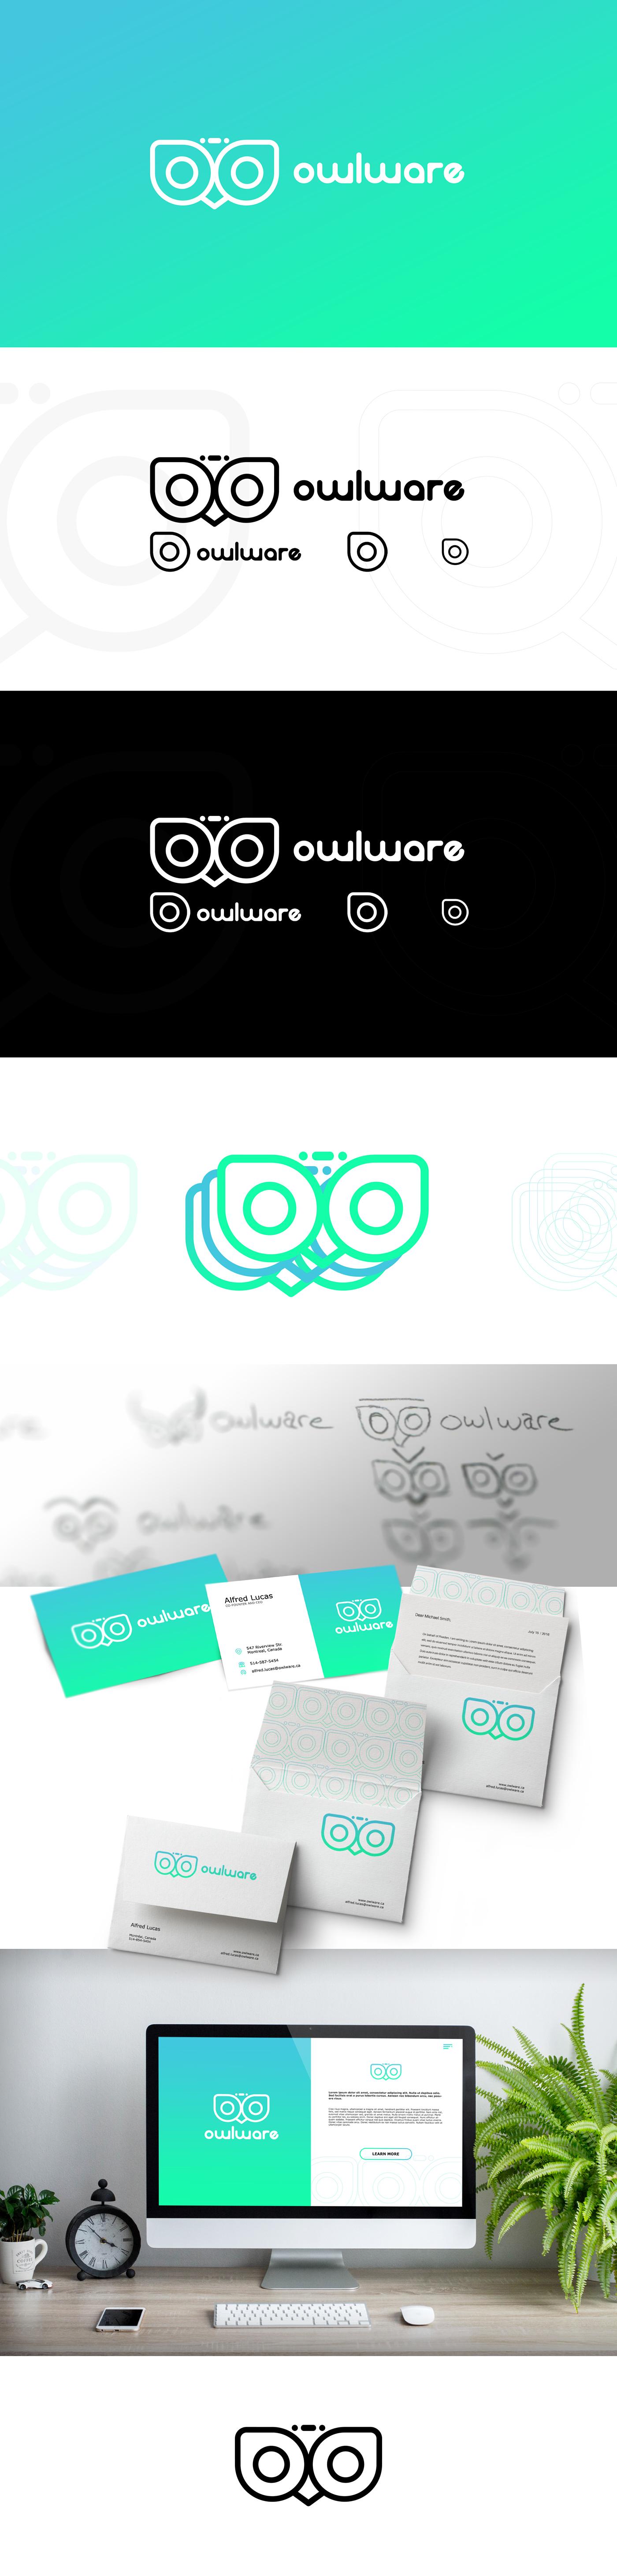 branding ,logo,design,software,owl